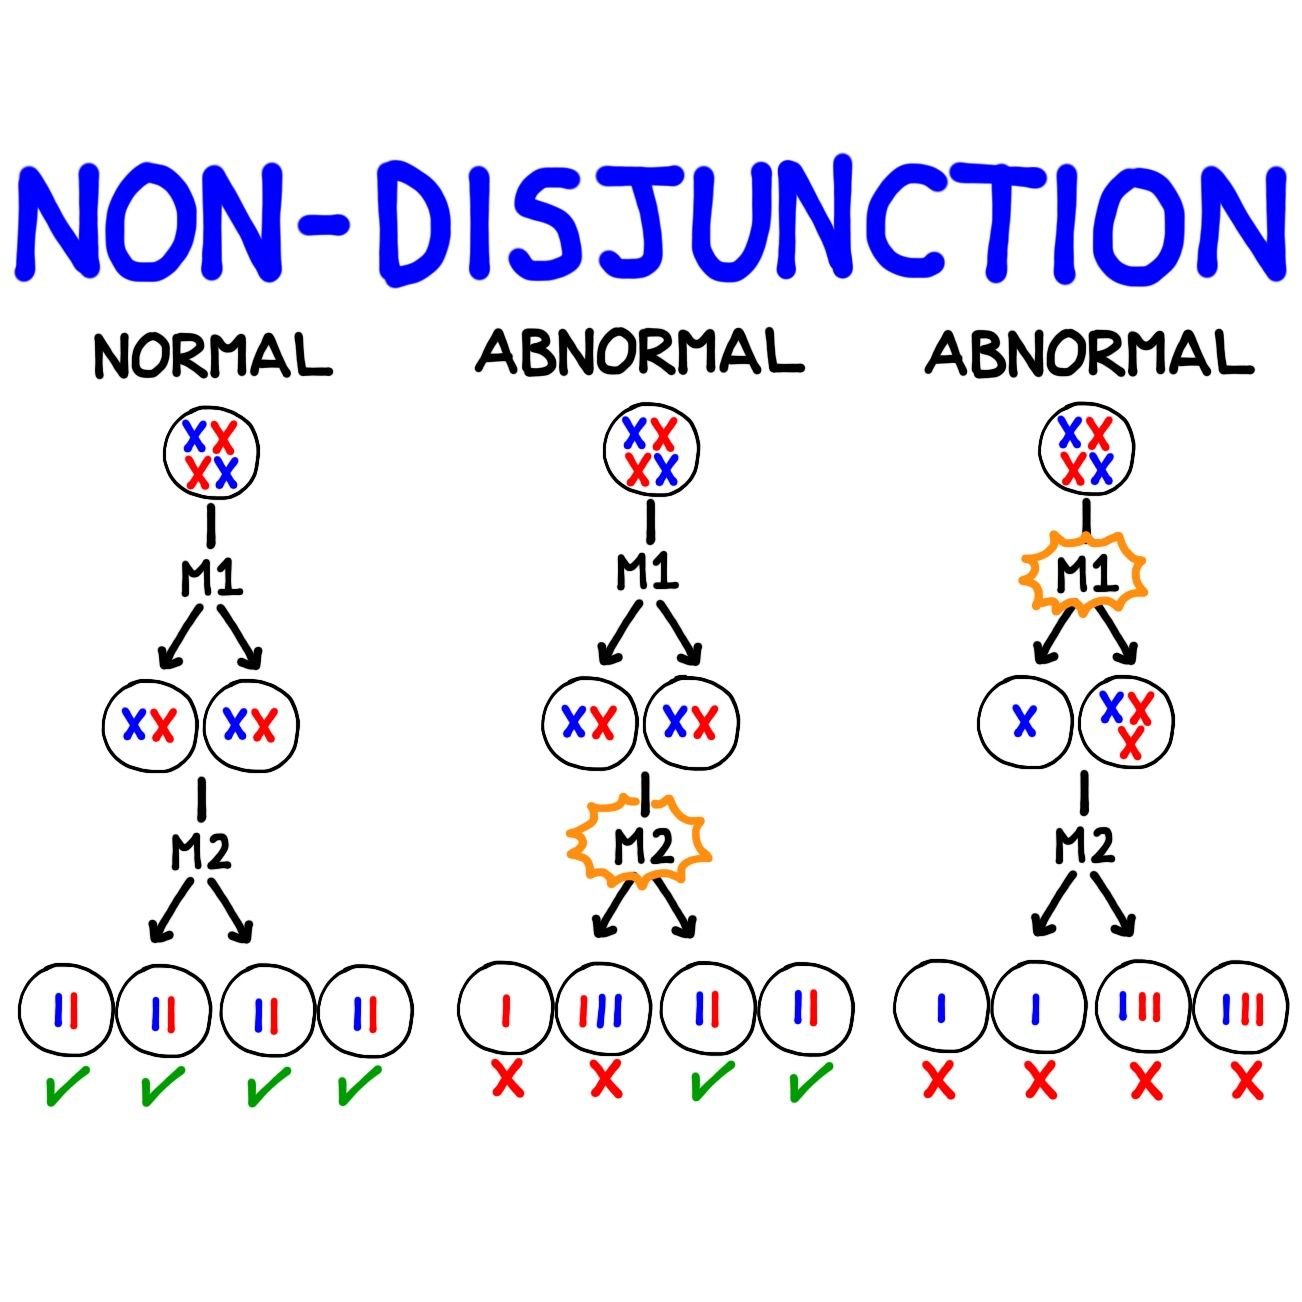 Pin By Bogobiology On Diagrams Chromosomal Abnormalities Abnormal Words [ 1302 x 1302 Pixel ]